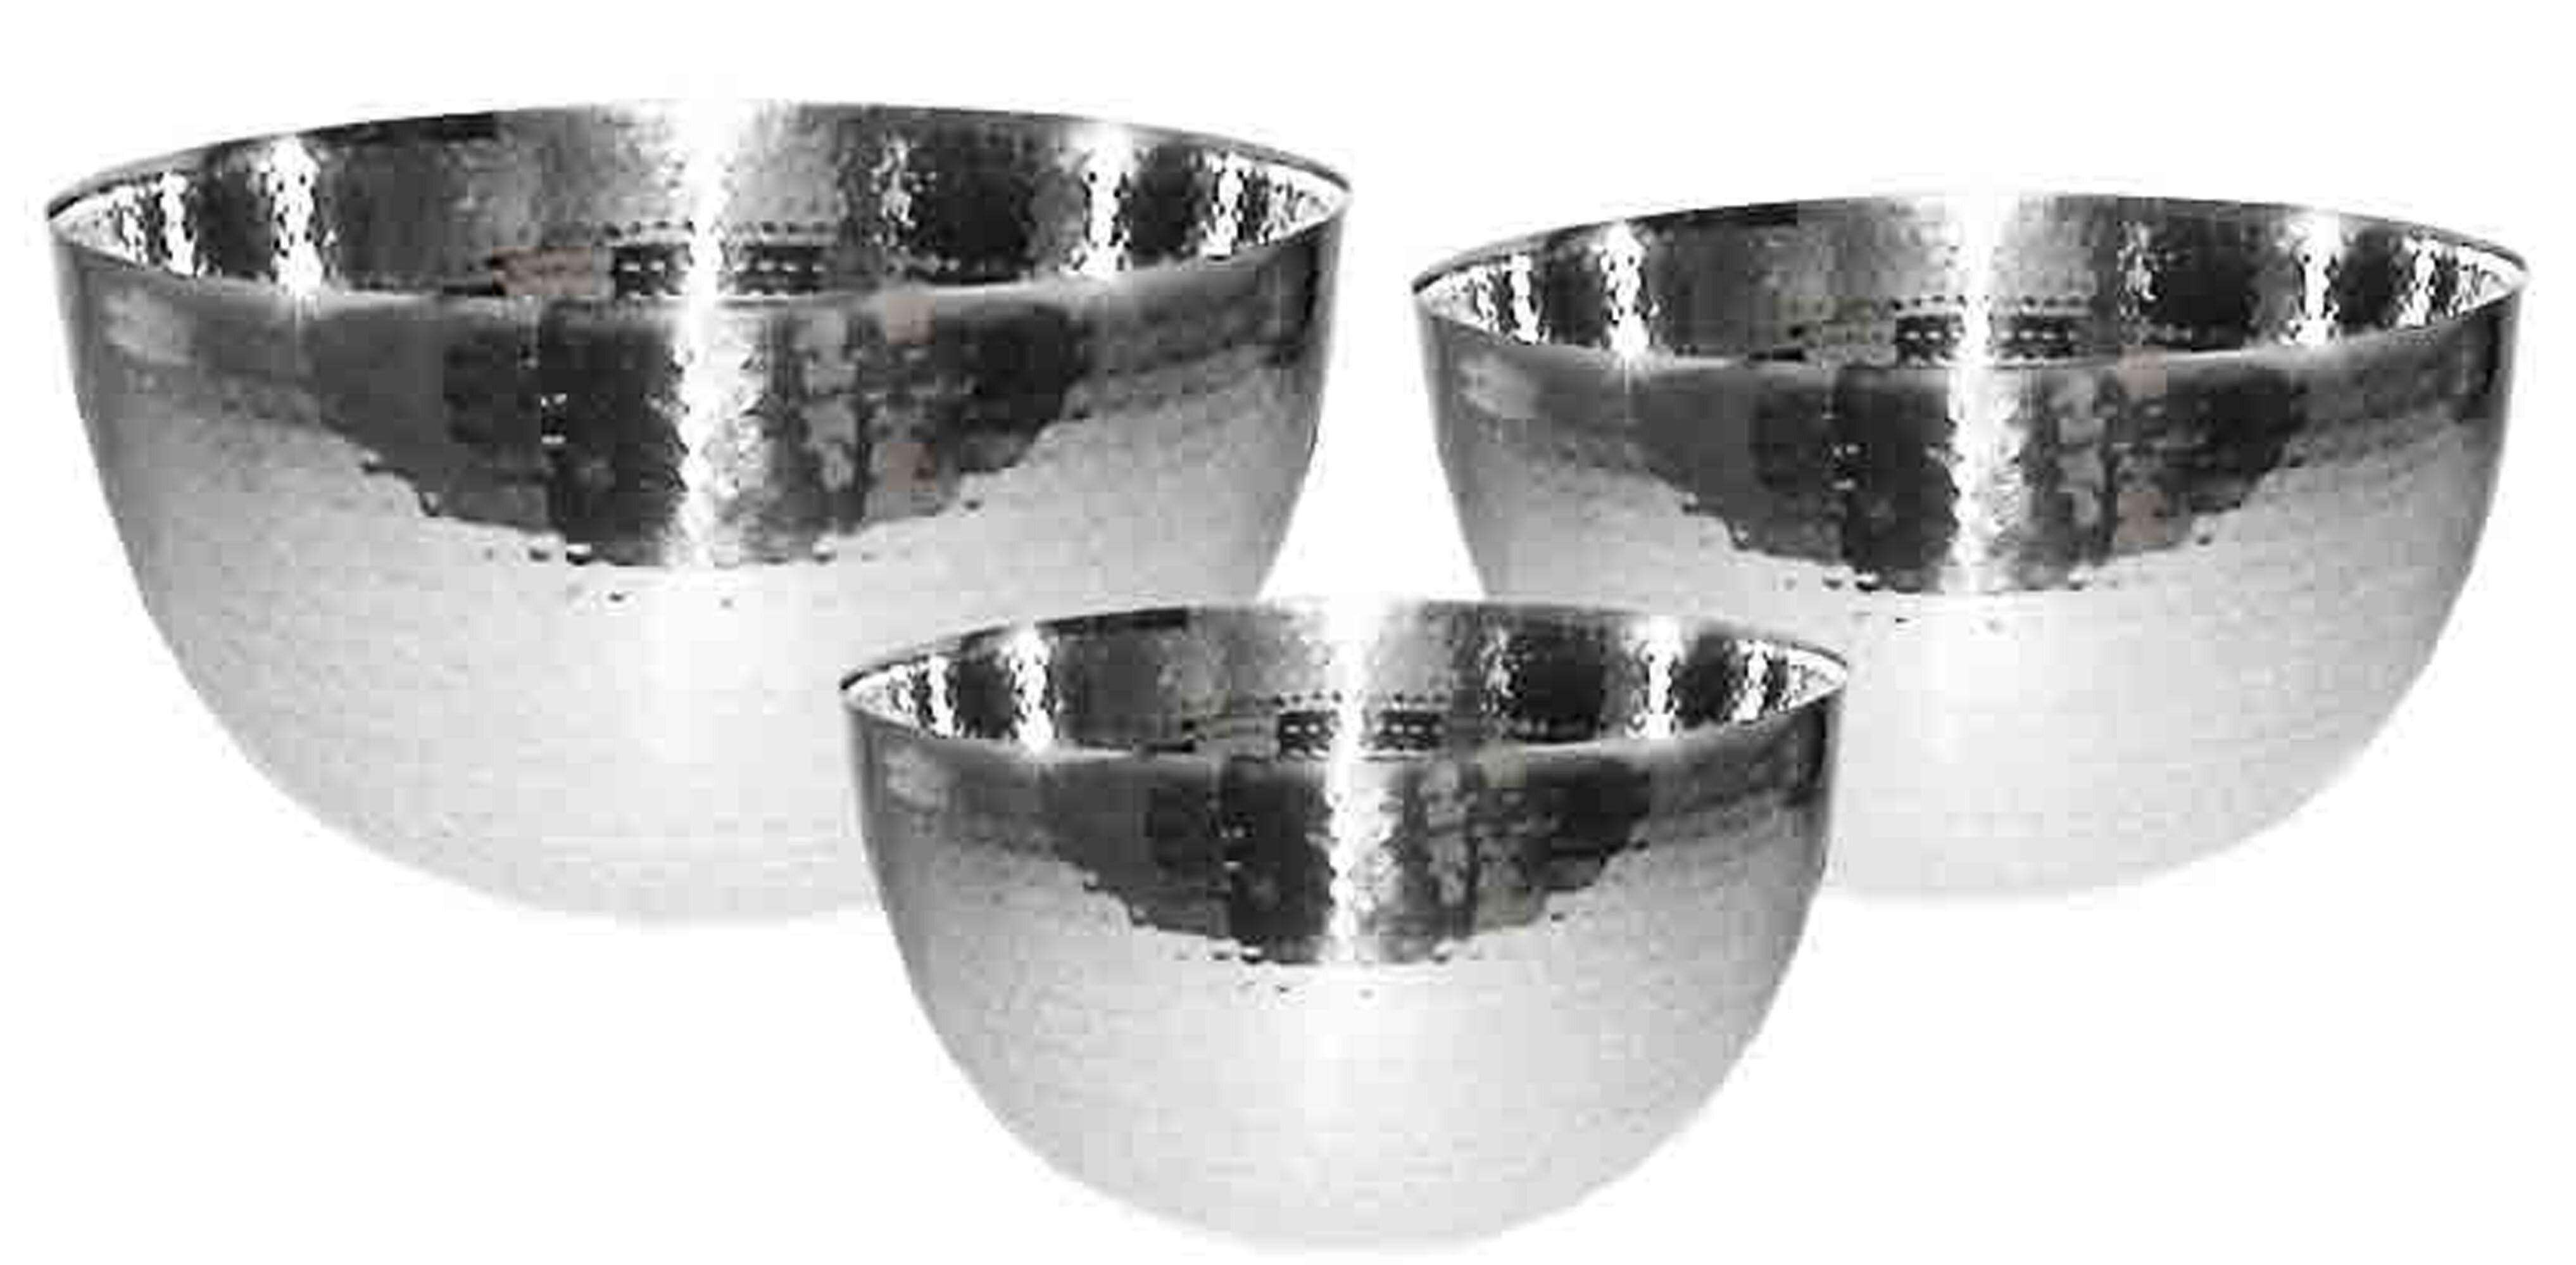 Universal Housewares Starcraft Hammered 3 Piece Stainless Steel Mixing Bowl Set Reviews Wayfair